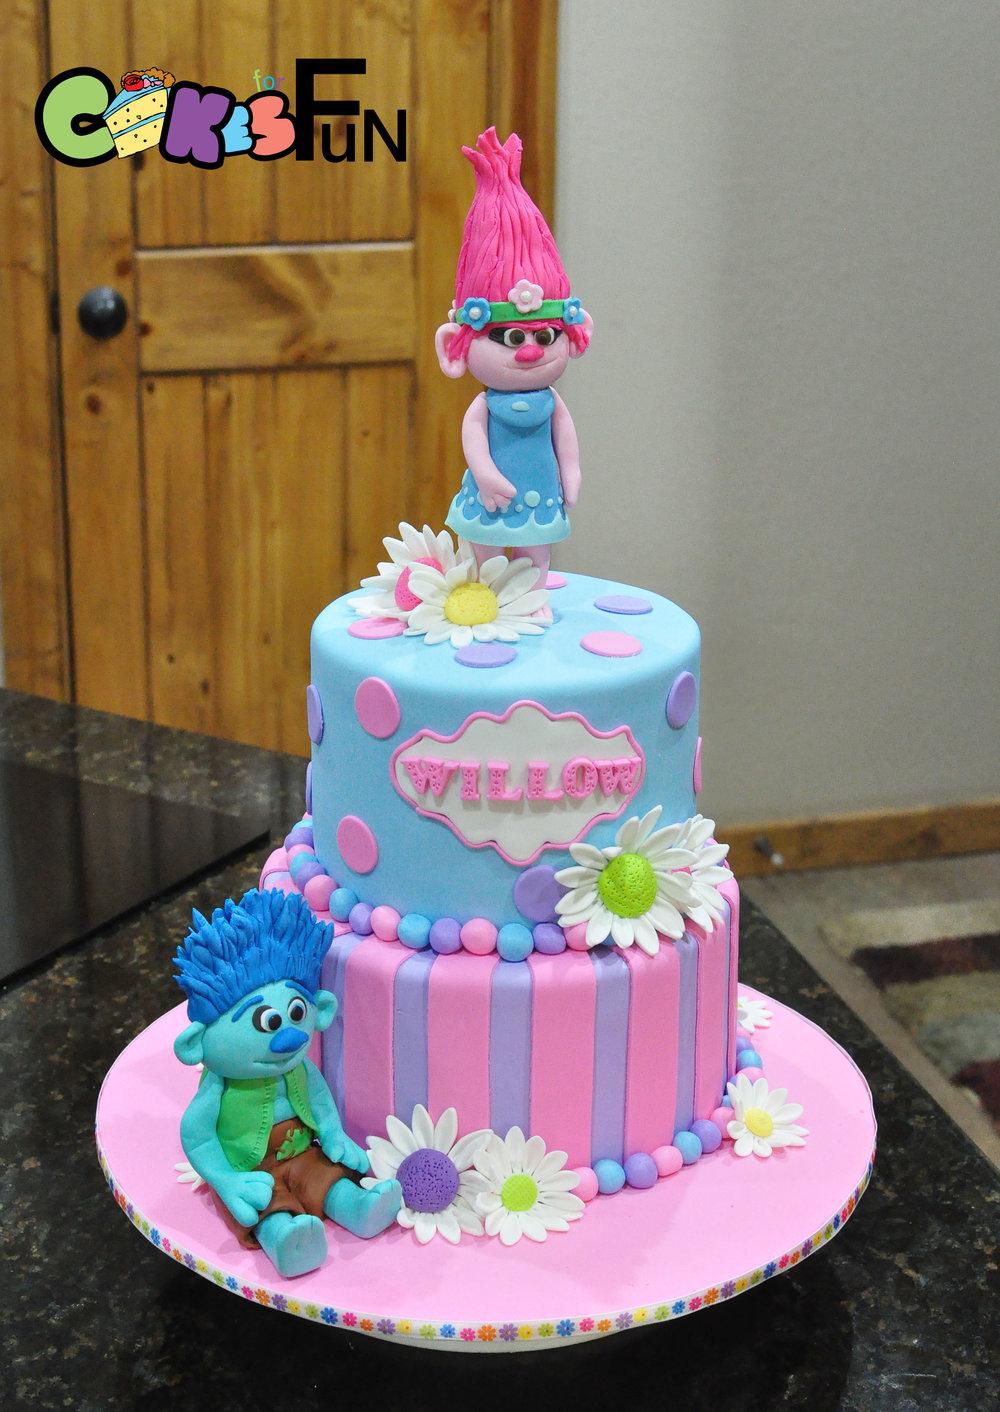 Troll Cake - Lesley-011918.jpg